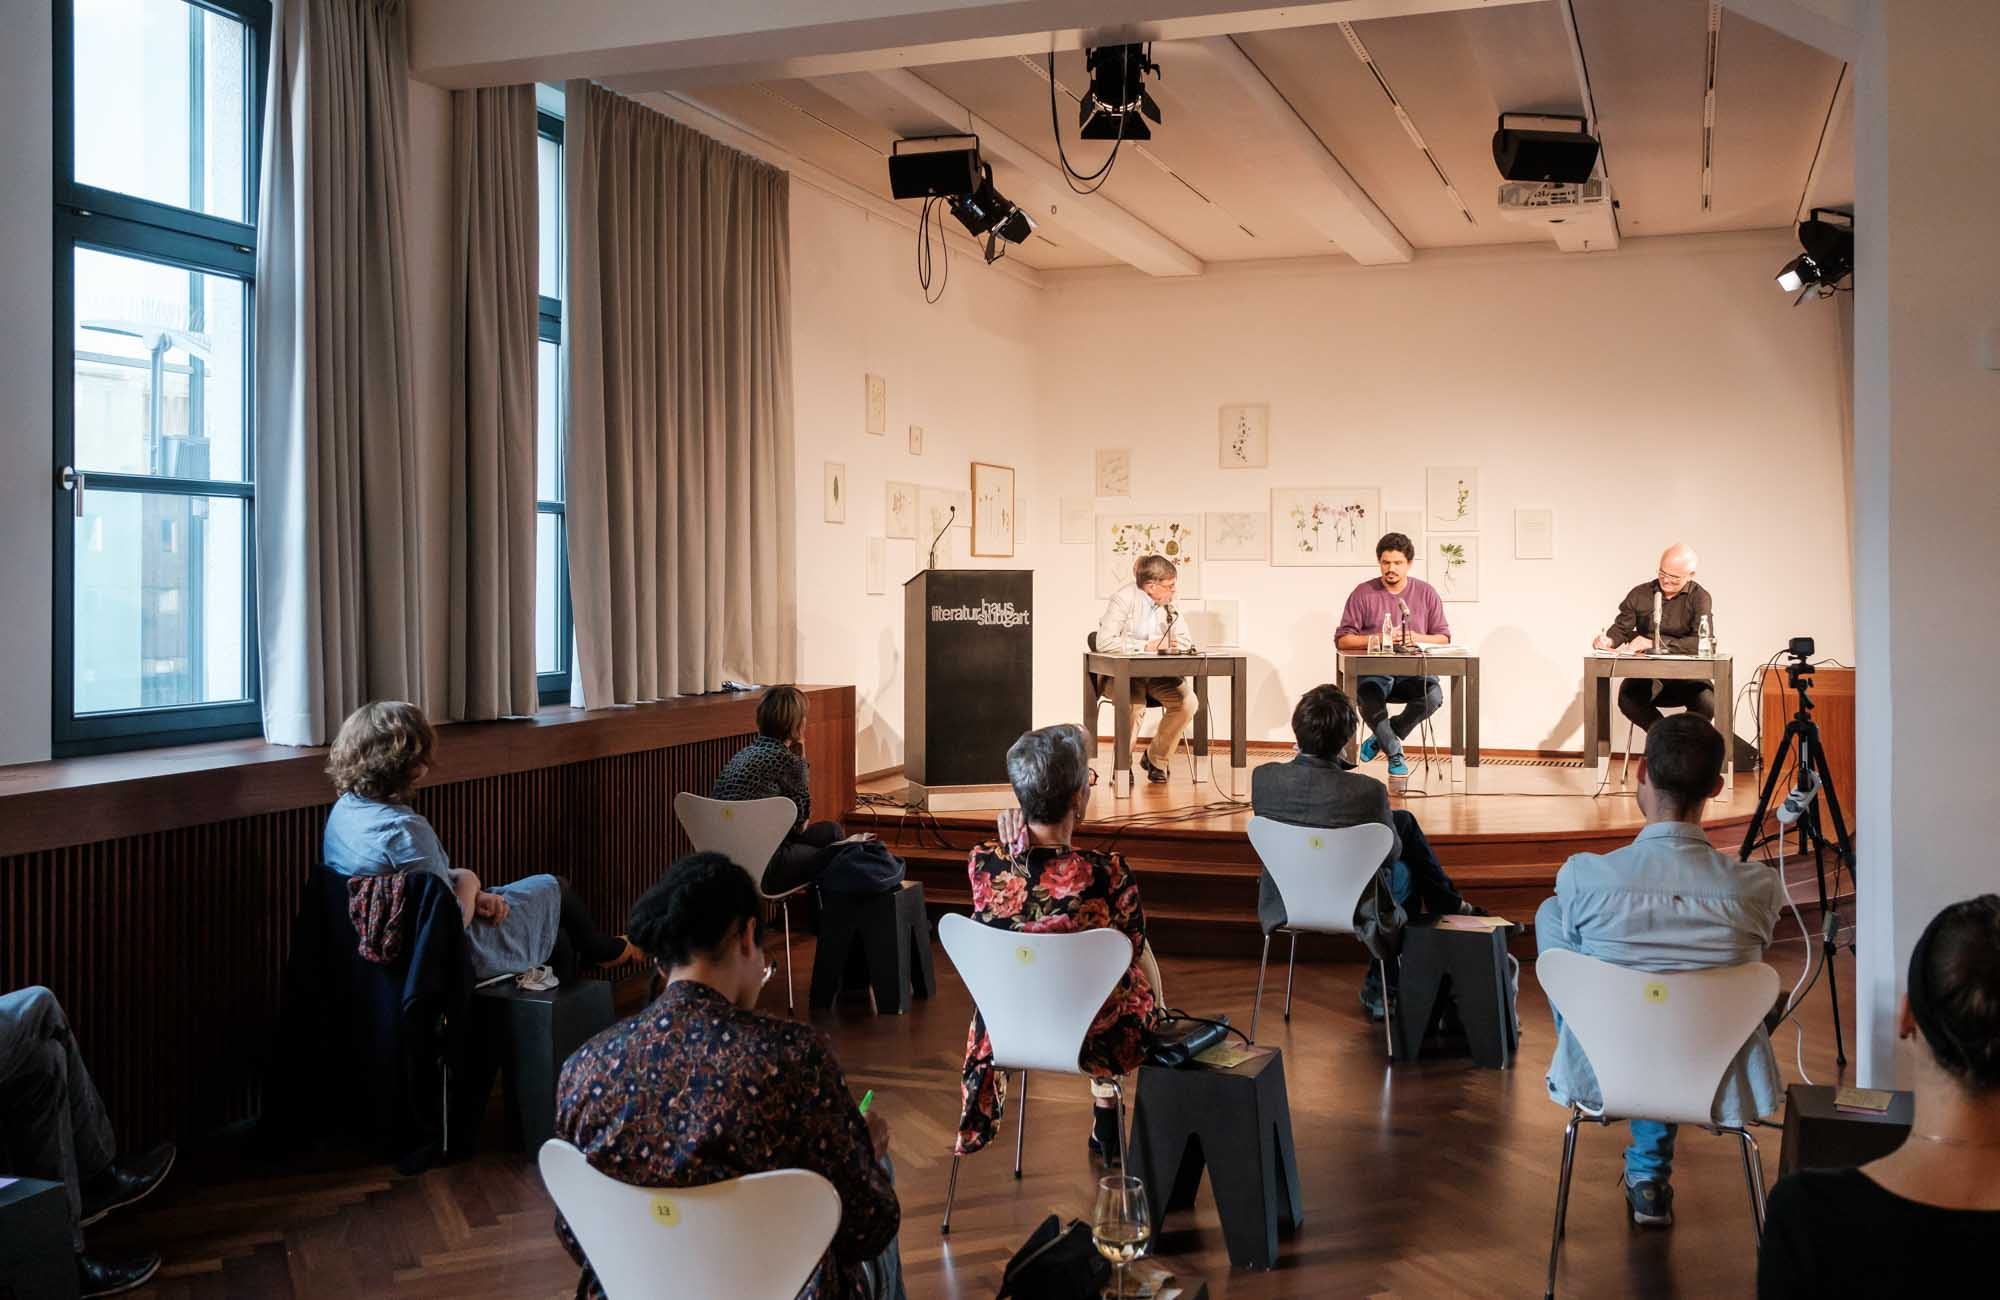 Vinicius Jatobá: Fokus Brasilien: Kultur in Zeiten von Corona <br/>(c) Sebastian Wenzel